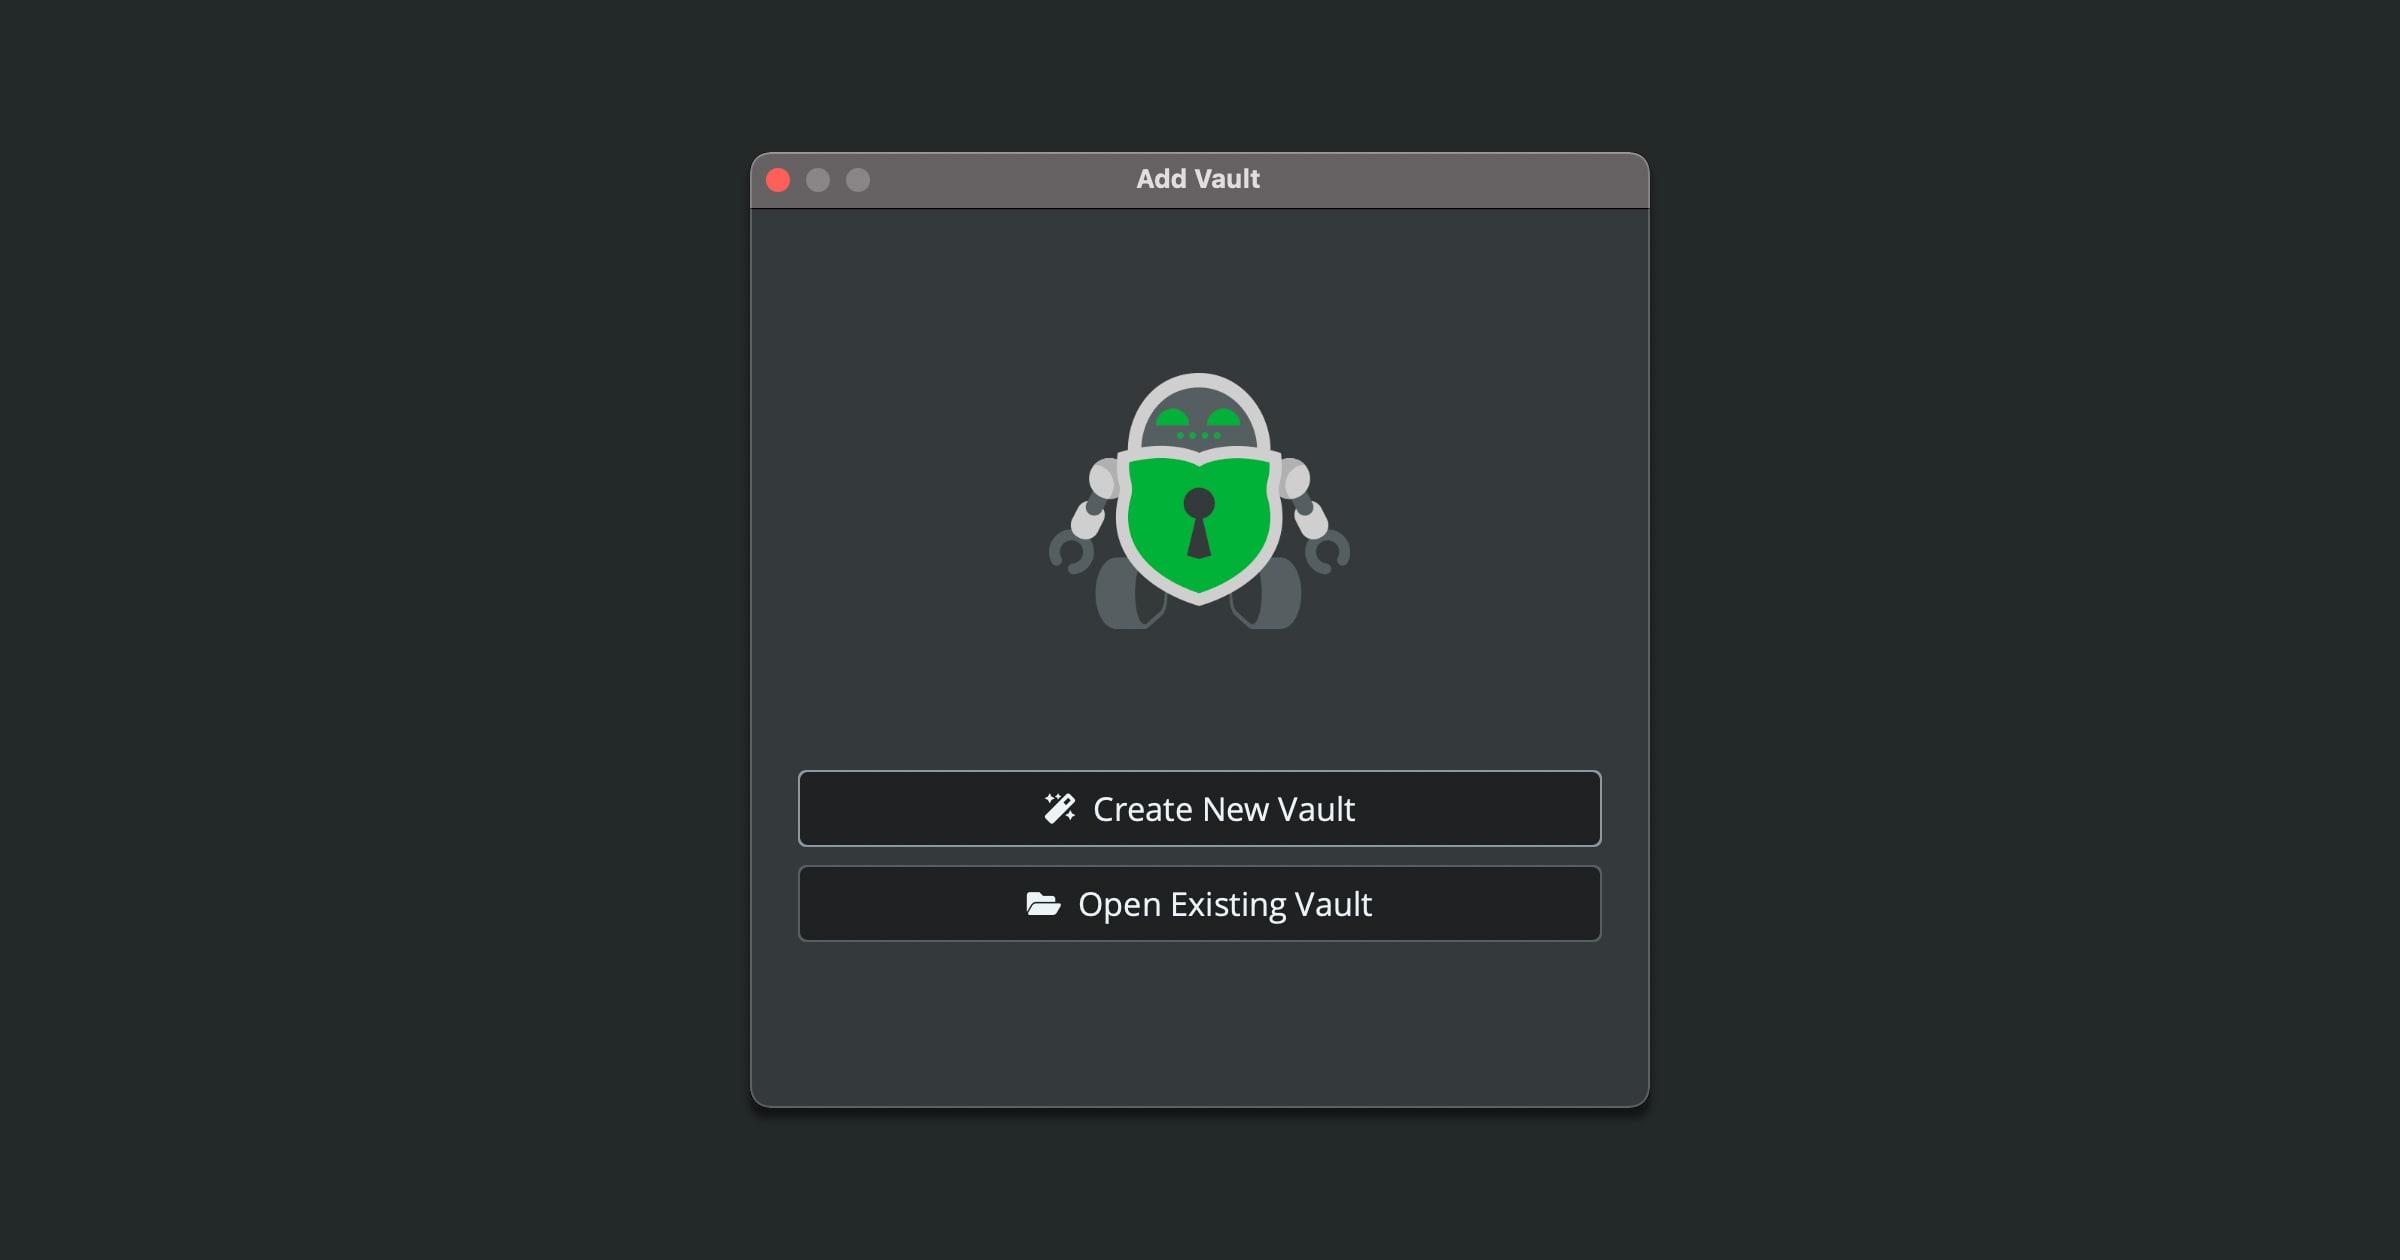 cryptomator for mac